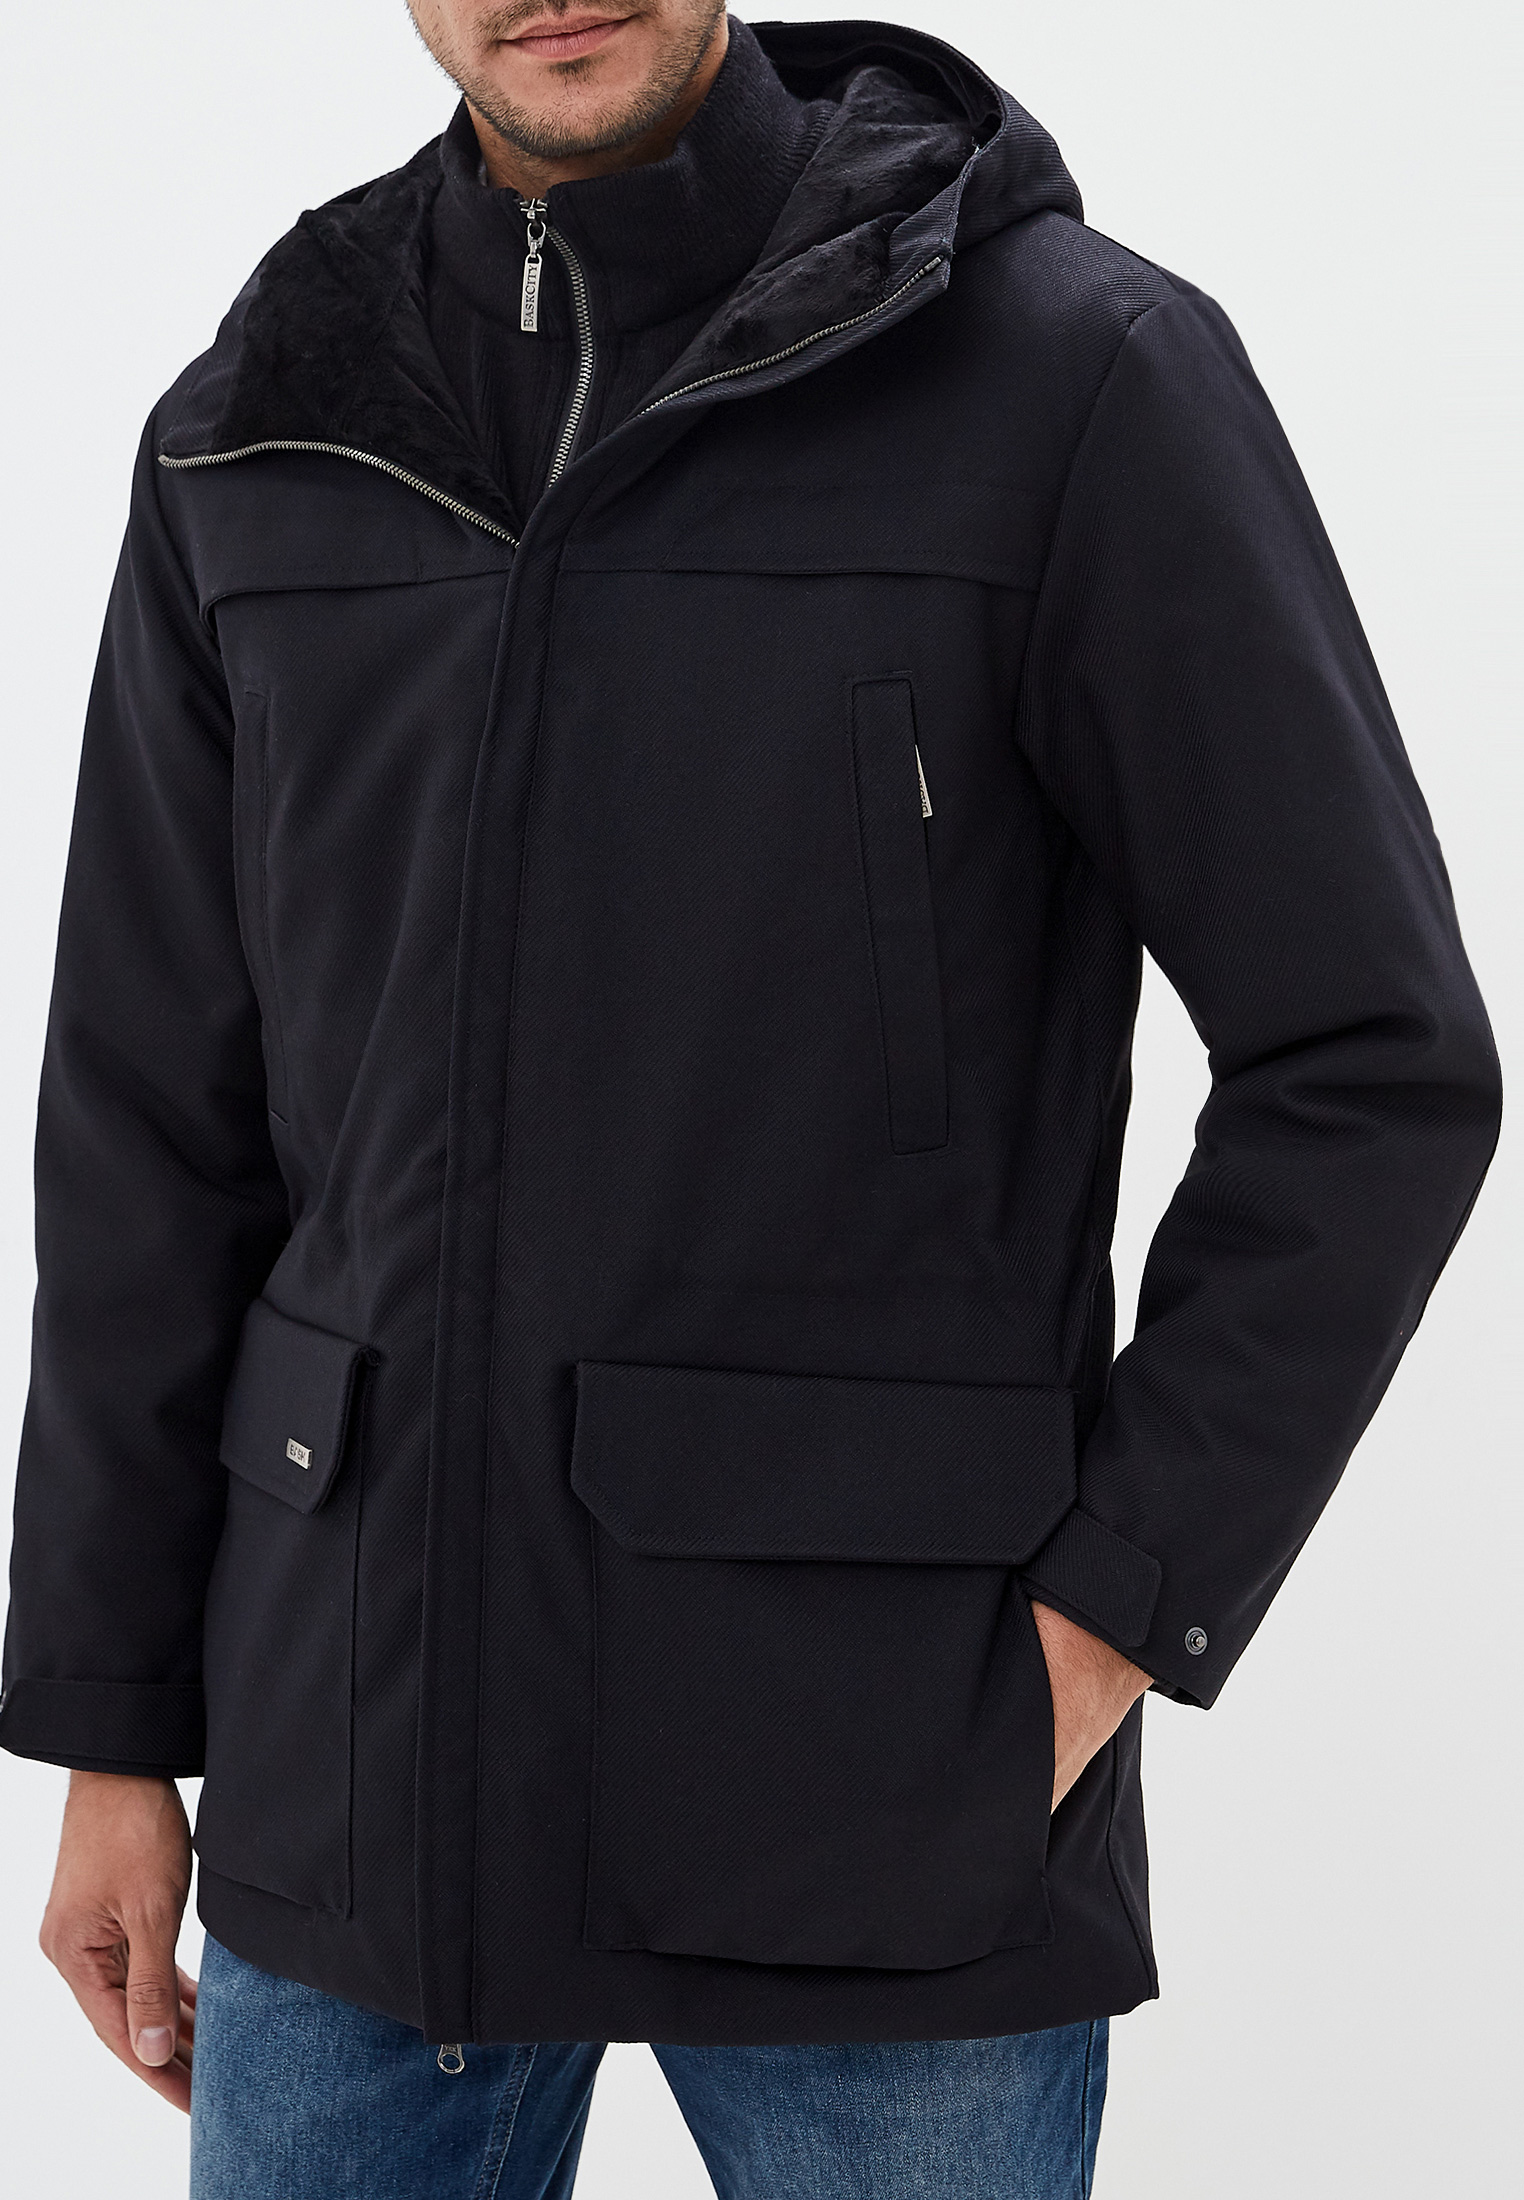 Утепленная куртка БАСК 1514-9009